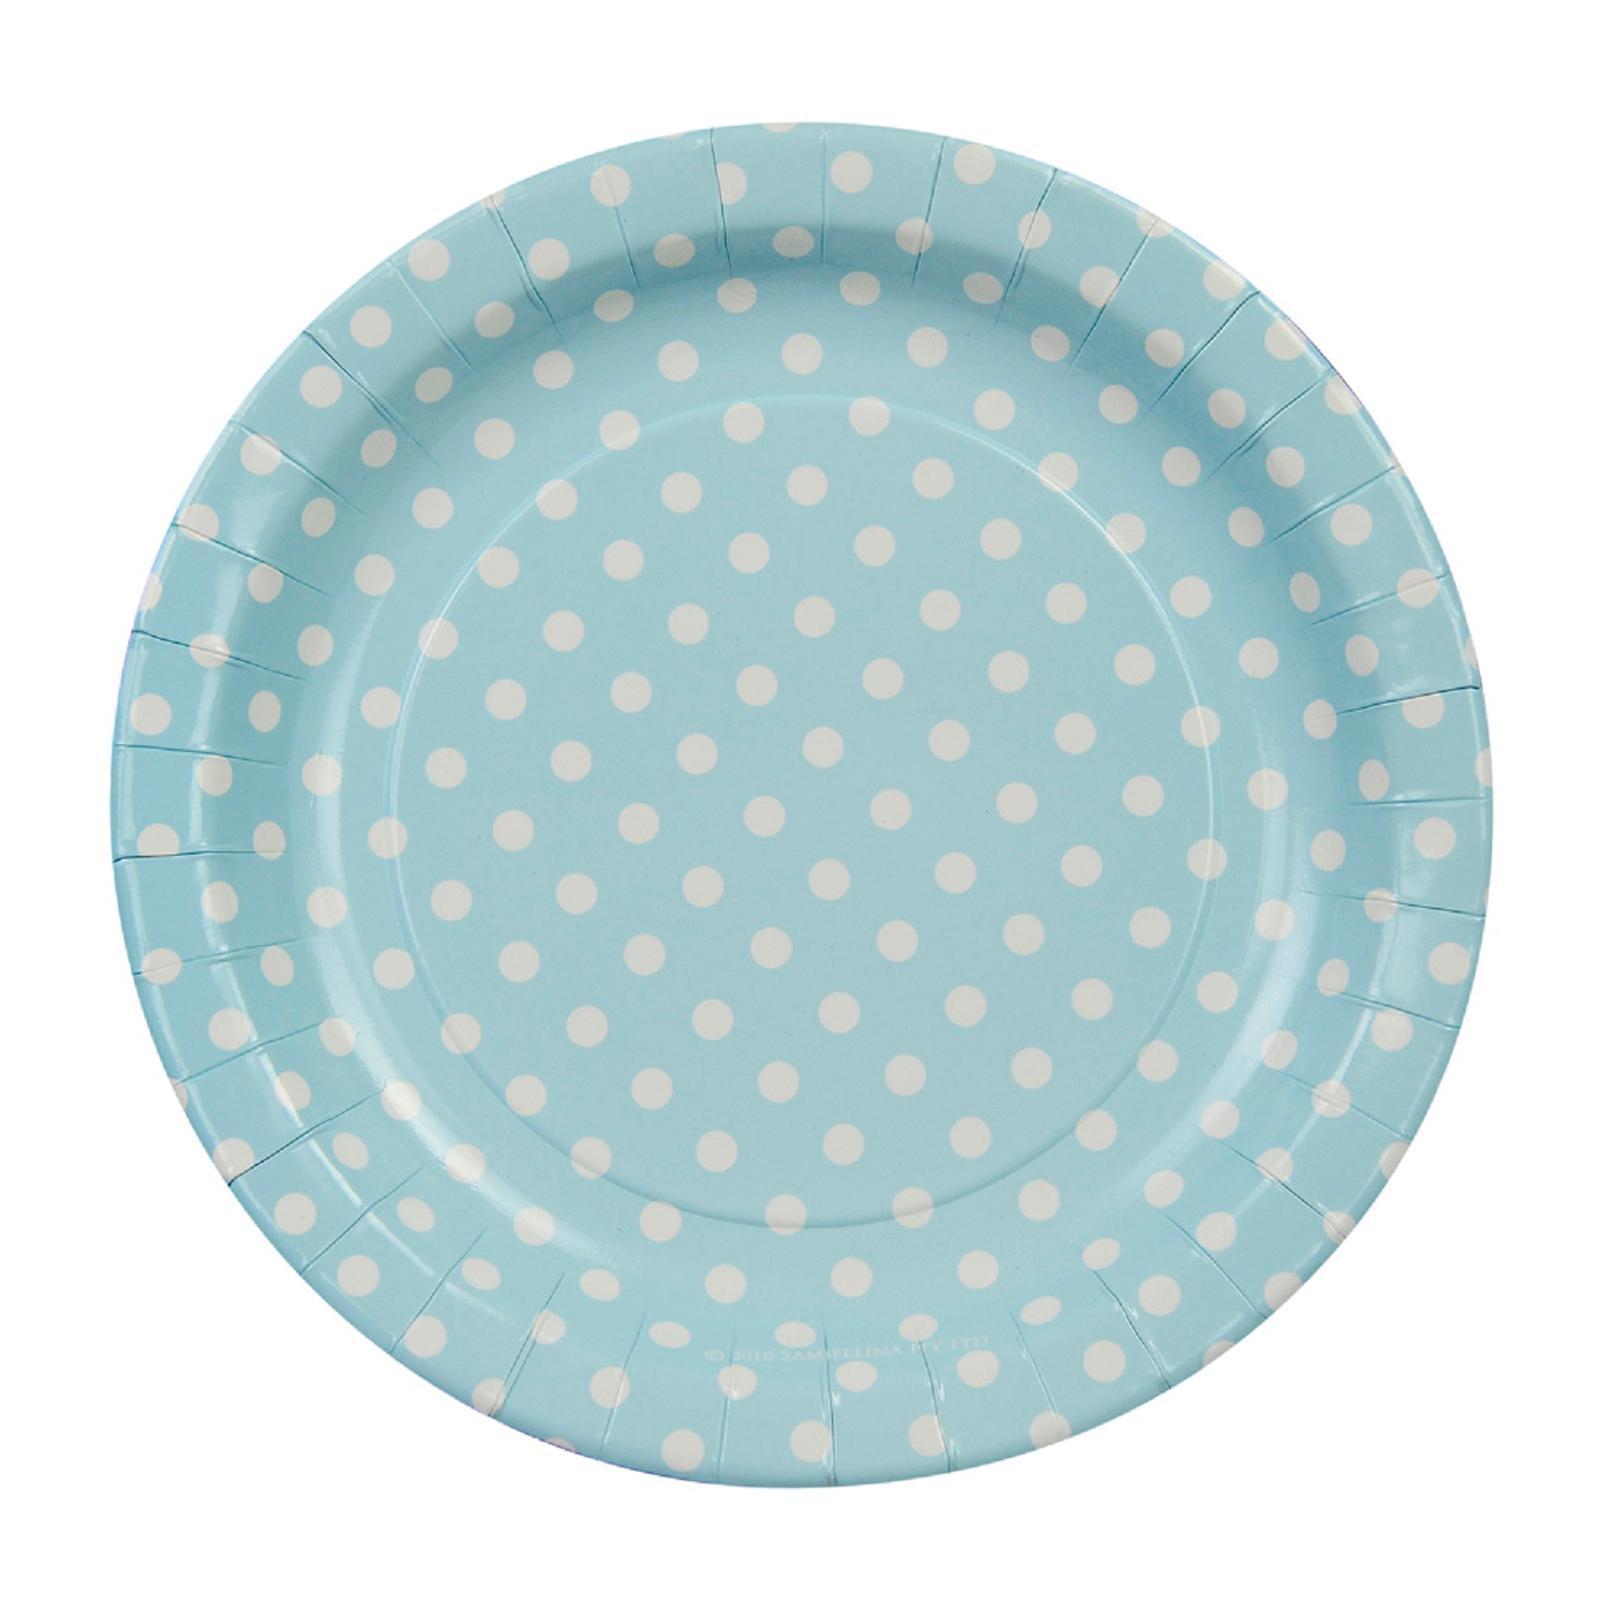 Sambellina Polkadot Blue 23 Cm Party Plates